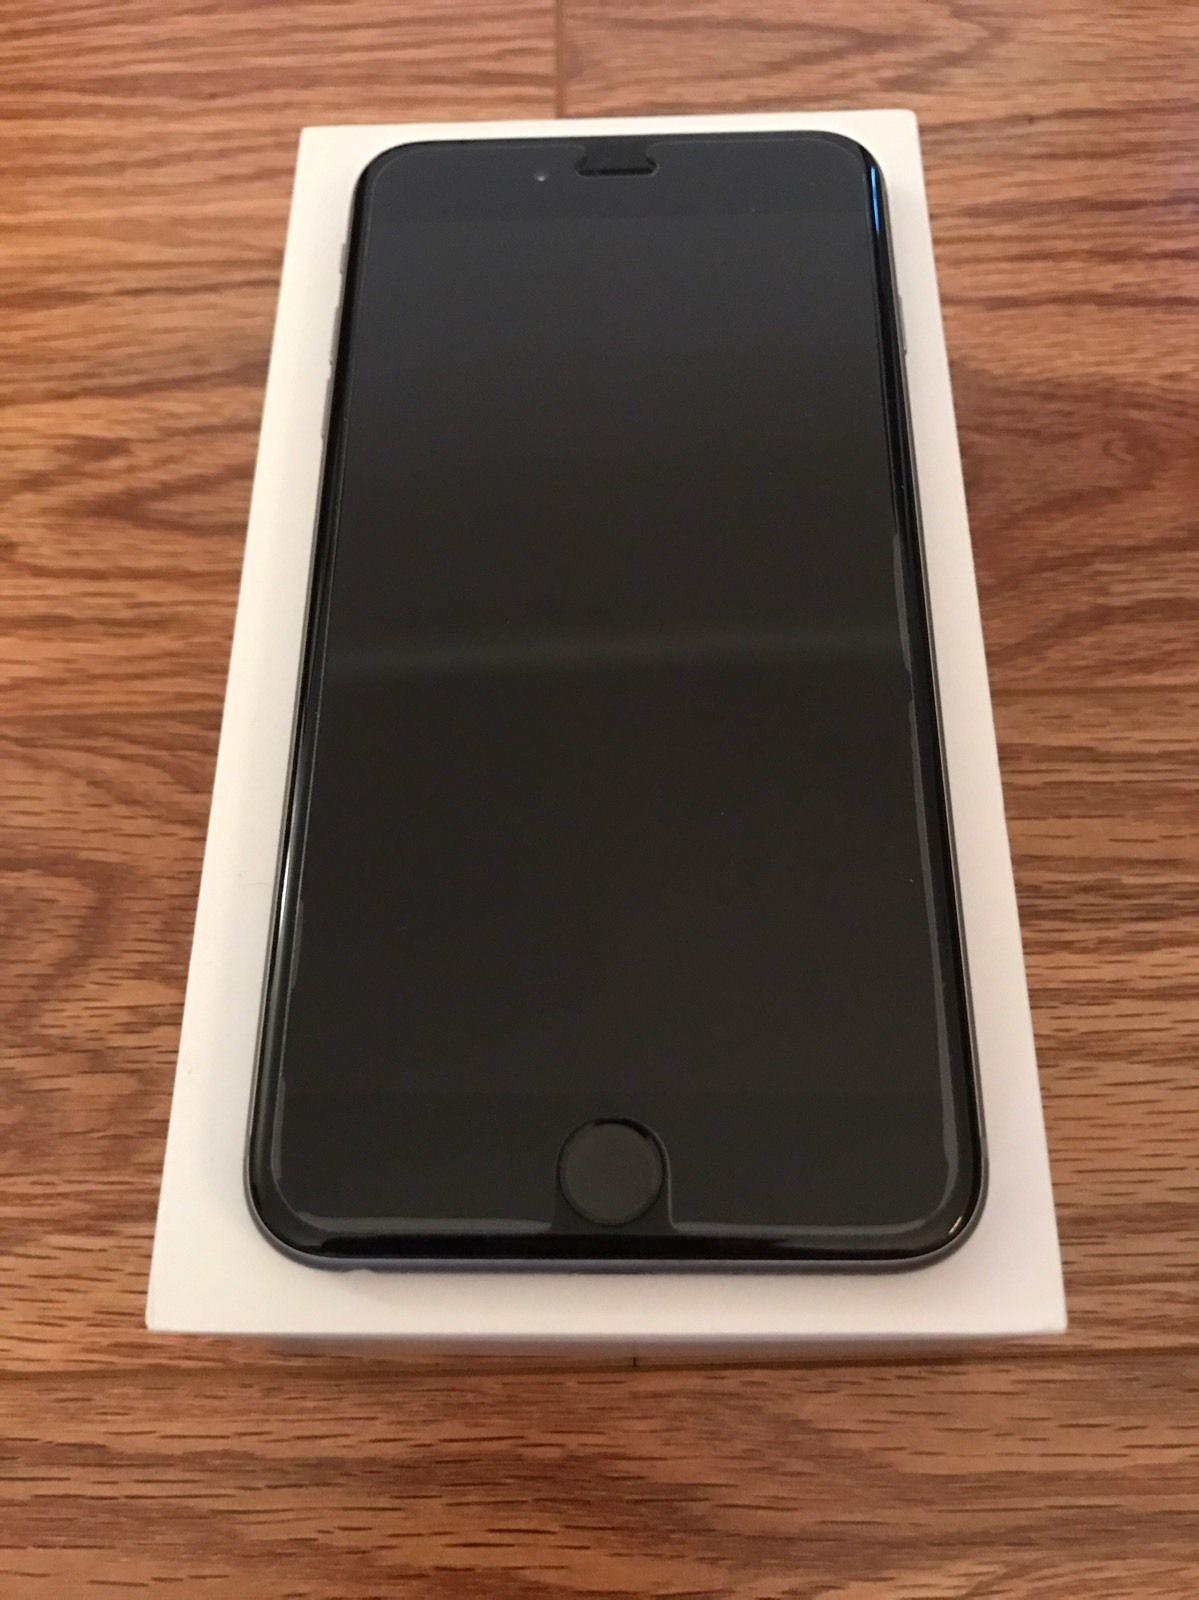 Apple-iPhone-6-Plus-128GB-Space-Gray-Unlocked-Smartphone